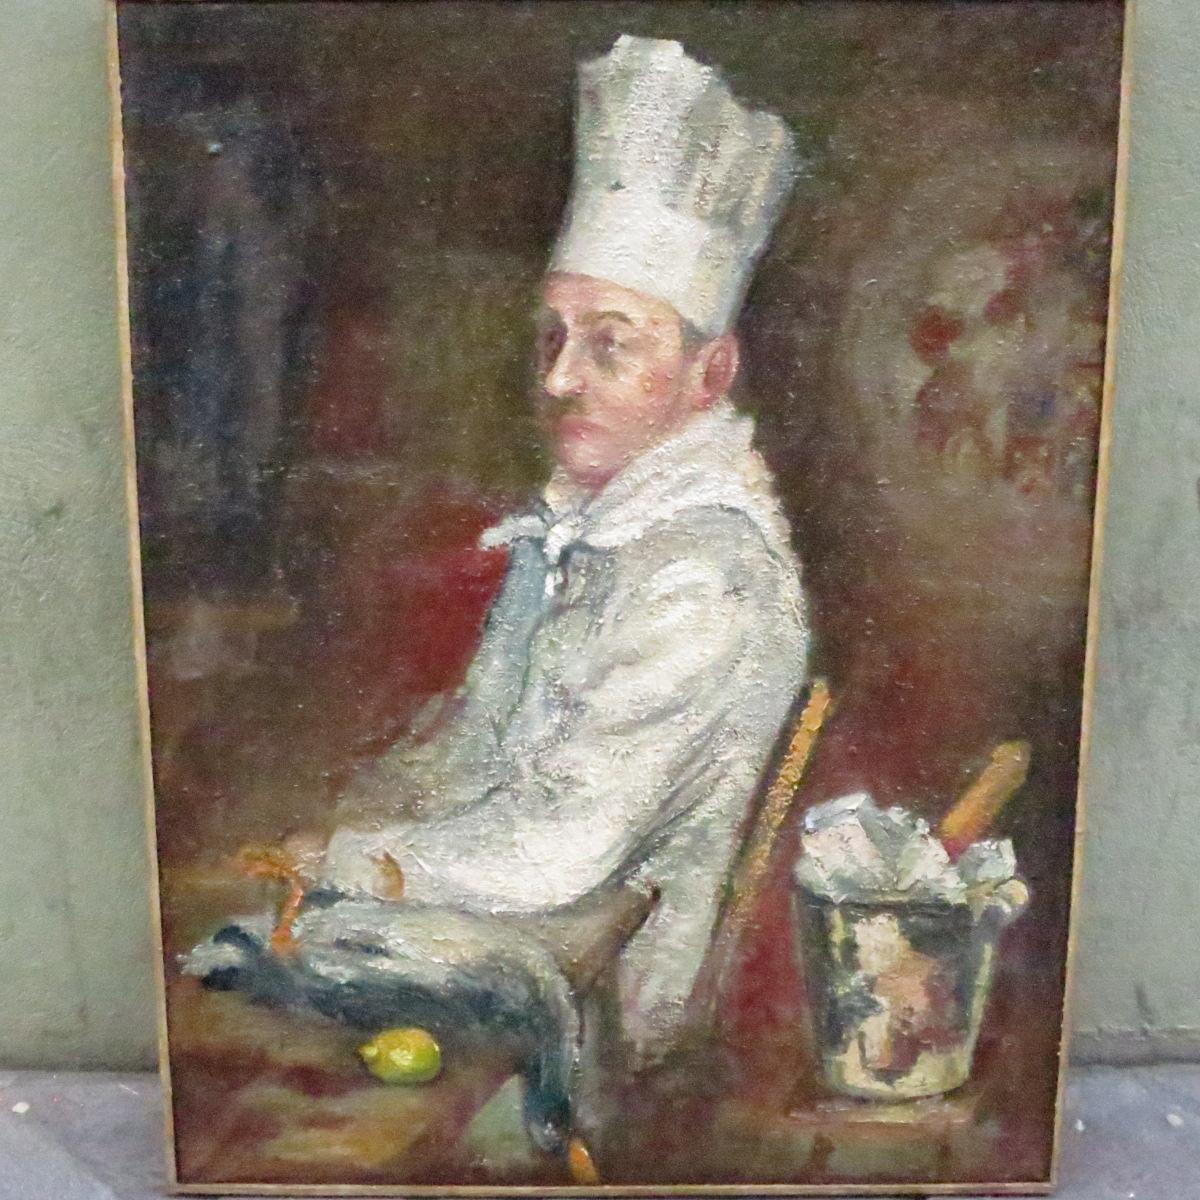 Jean SCHWECKLER grande huile sur toile CHEF CUISINIER 110 x 85 cm restaurant